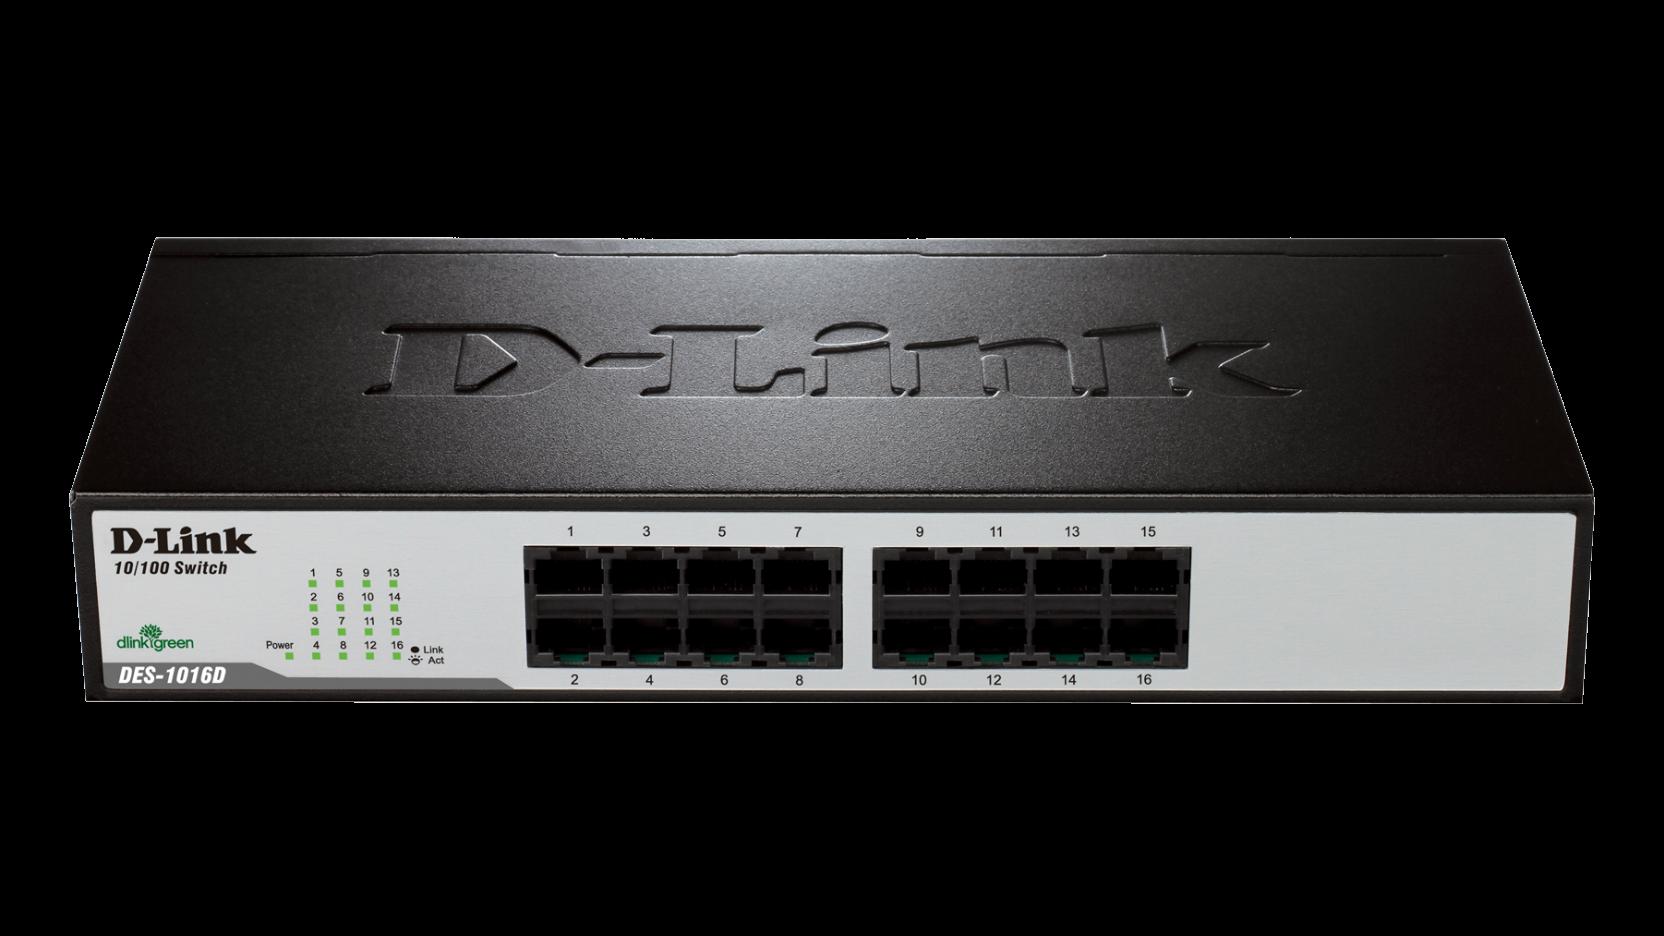 Des 1016d 16 Port Fast Ethernet Switch Rj 45 Auto Uplink